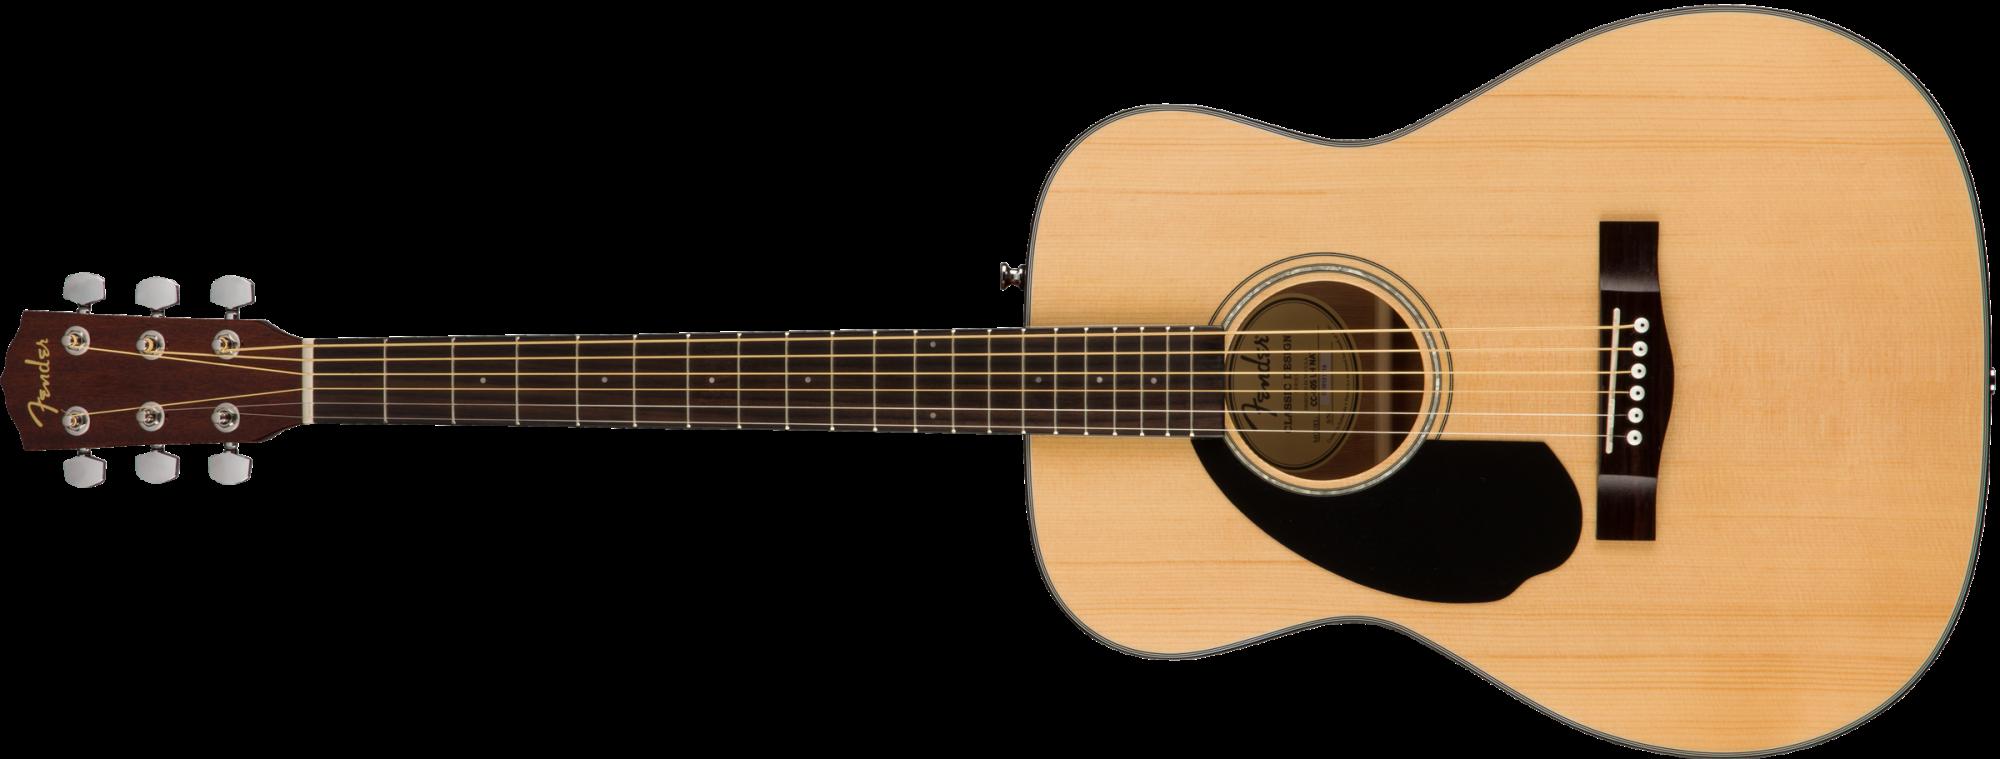 Fender CC-60S Concert LH, Walnut Fingerboard, Natural